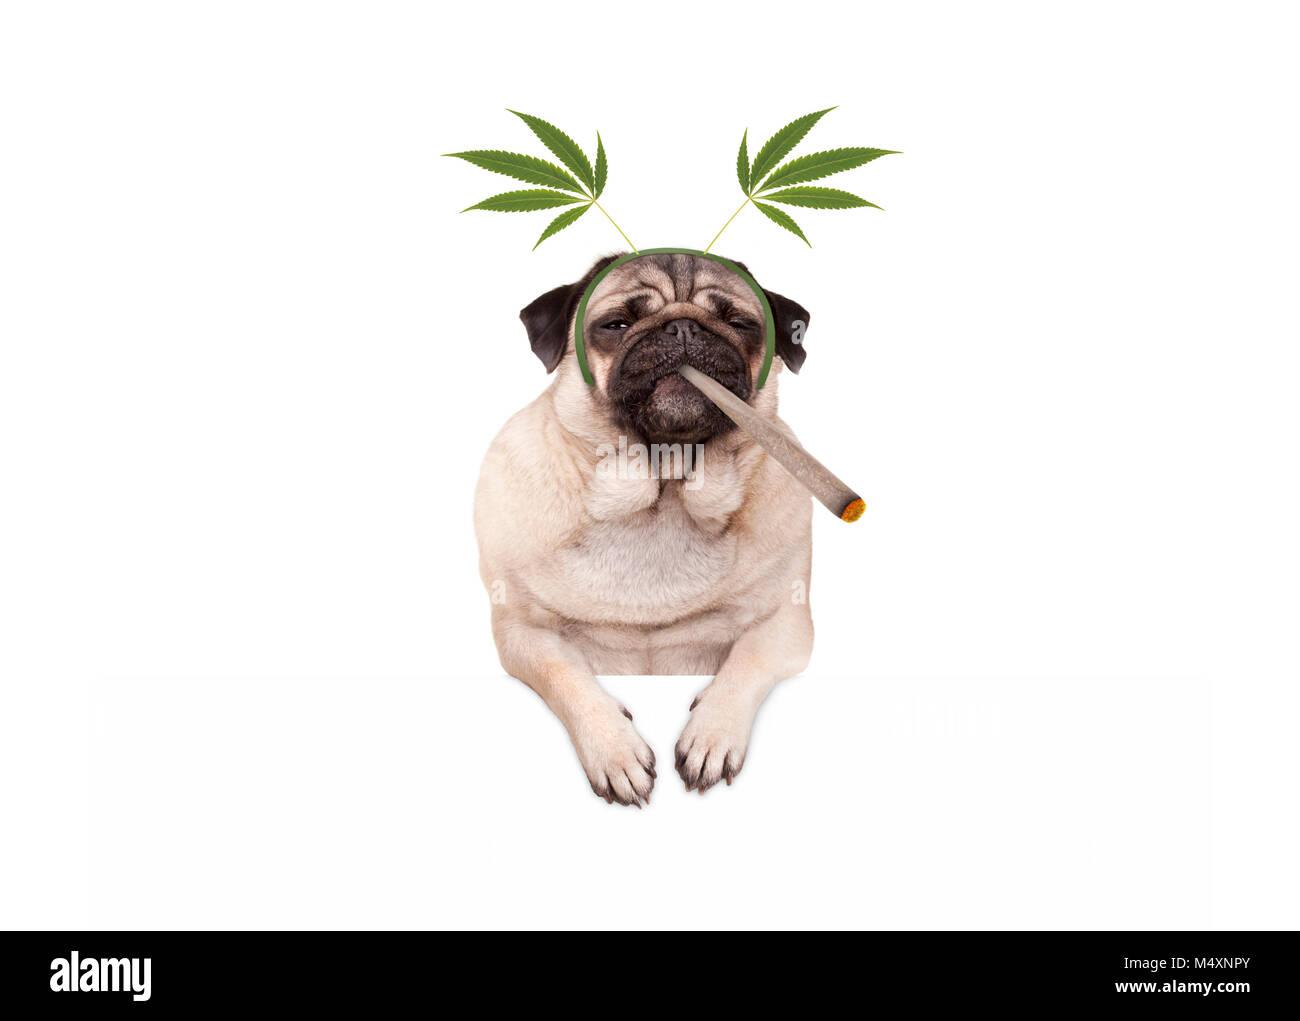 pug puppy dog being high, smoking marijuana weed joint, wearing hemp leaves diadem, isolated on white banner - Stock Image